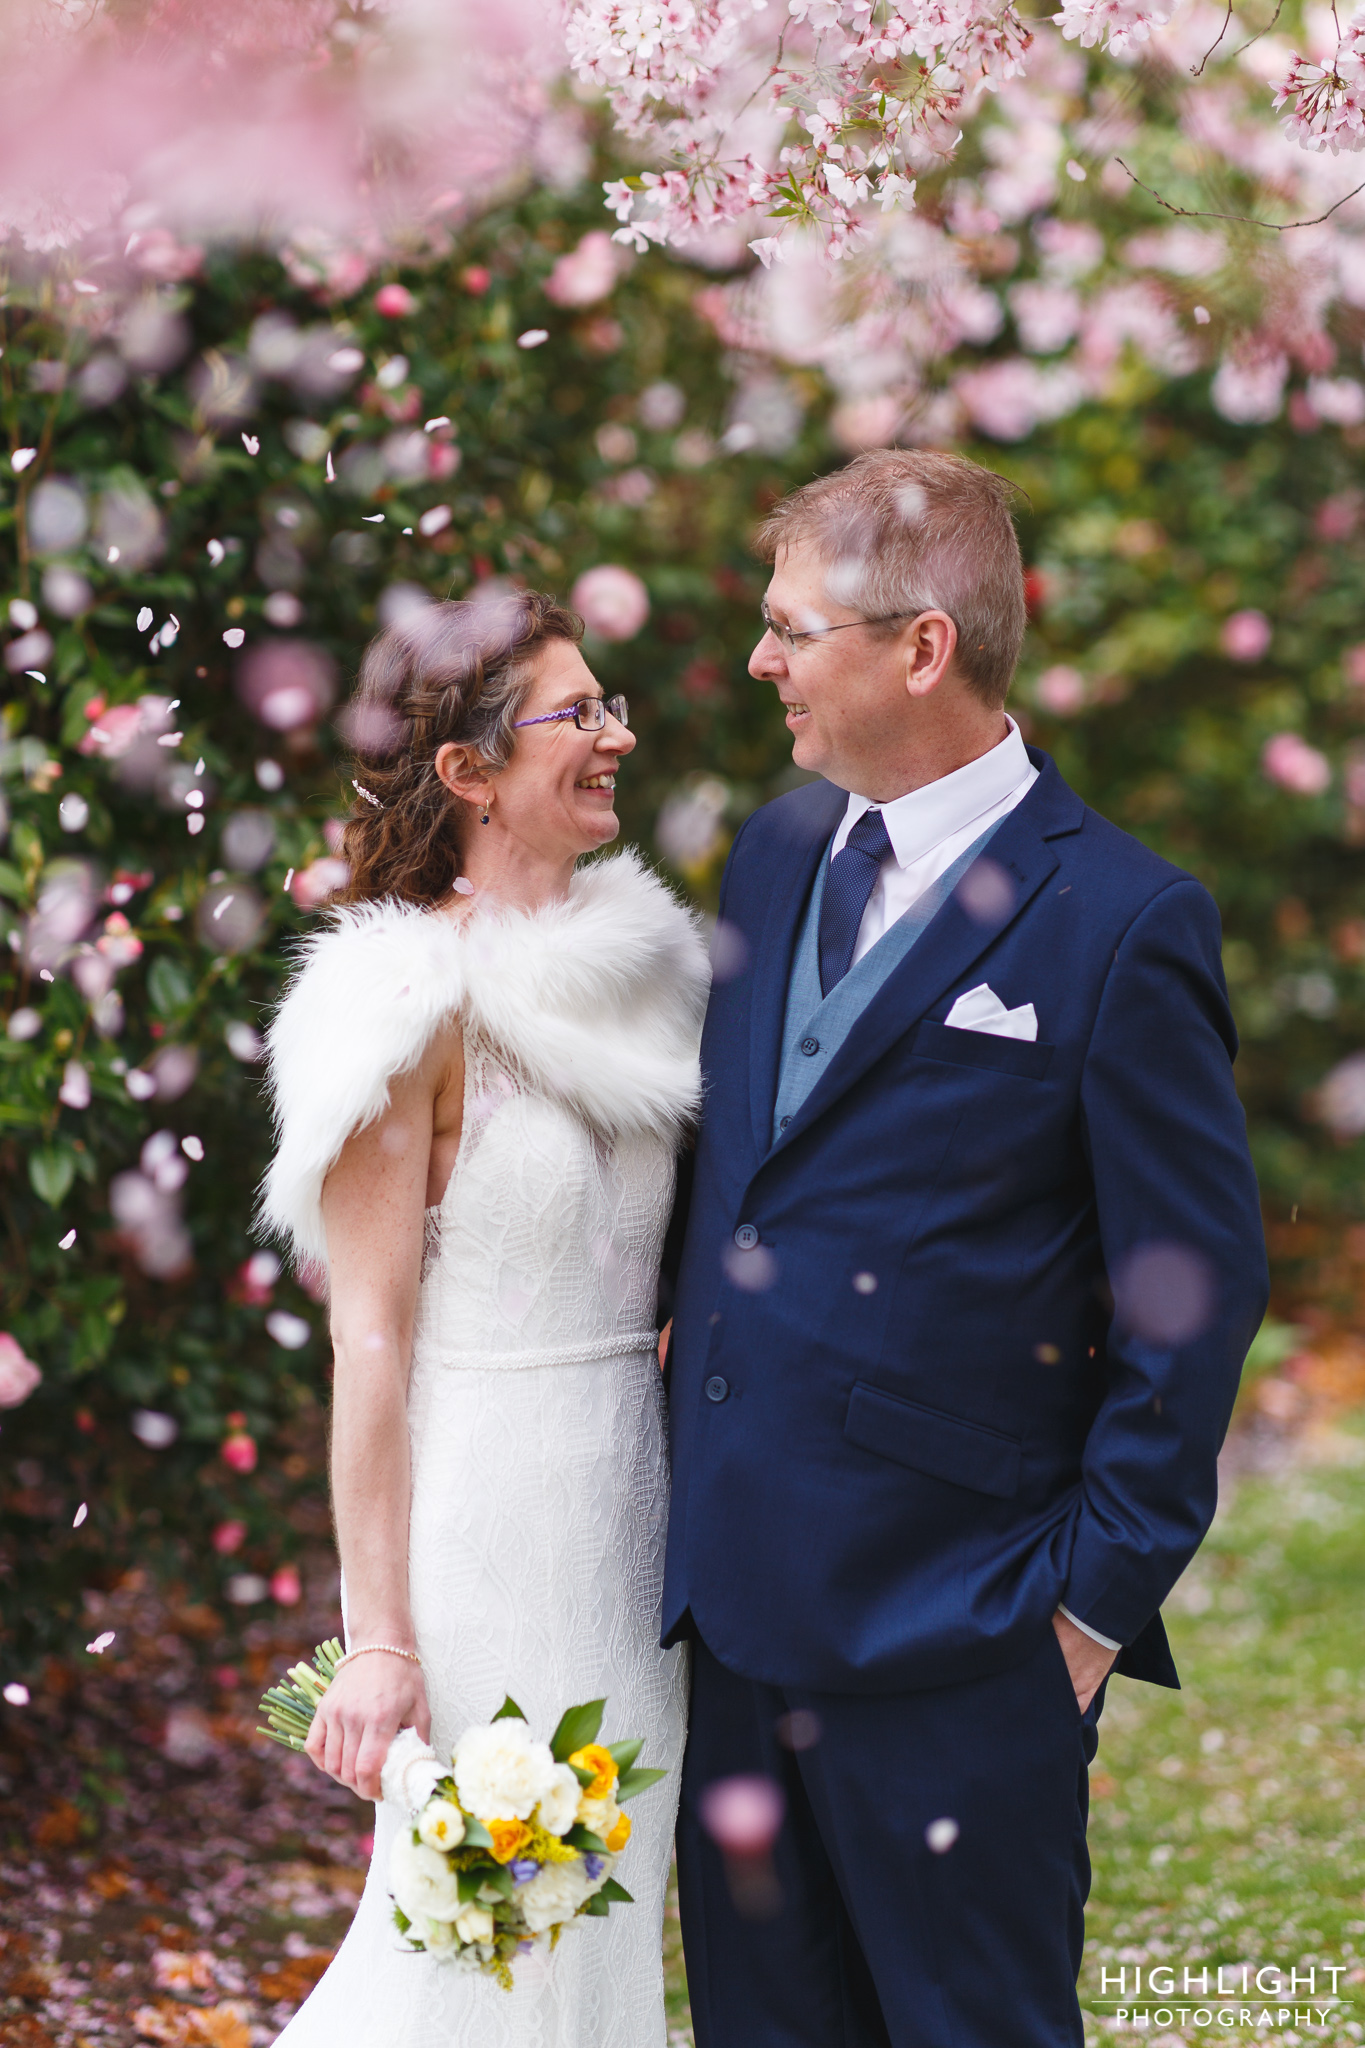 highlight_wedding_photography_palmerston_north_manawatu_chalet_wedding-1.jpg